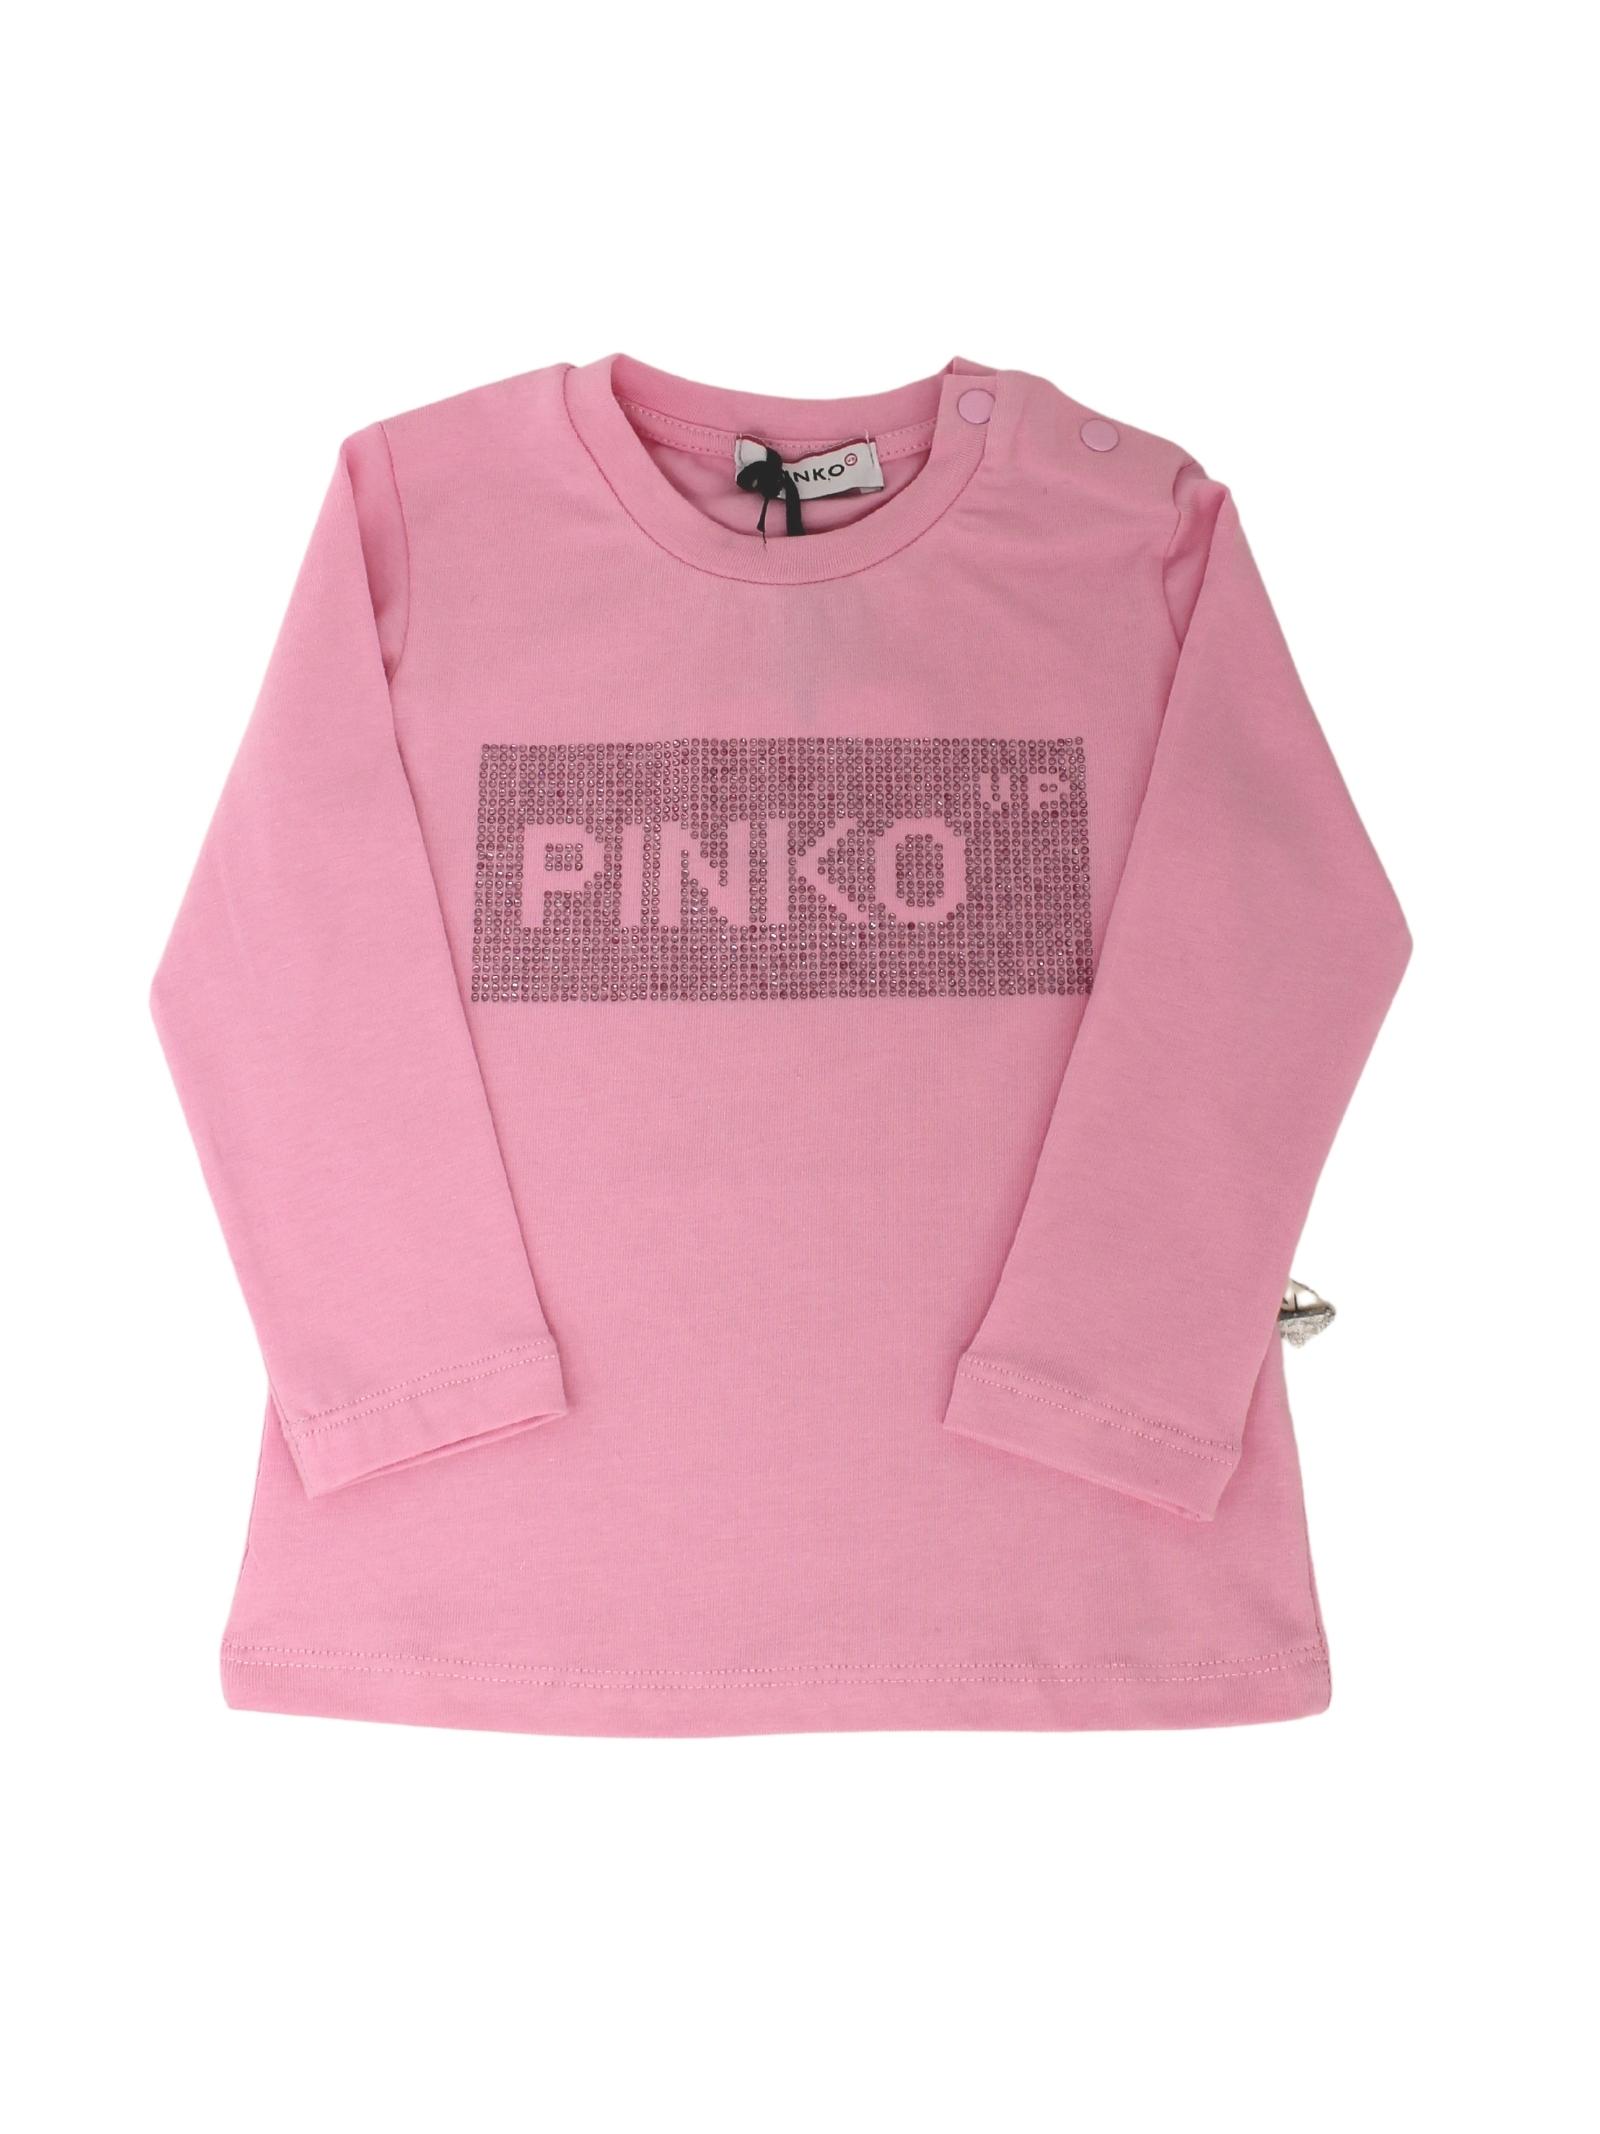 T-shirt Logo Brillantini Bambina PINKO UP | T-shirt | 028737042